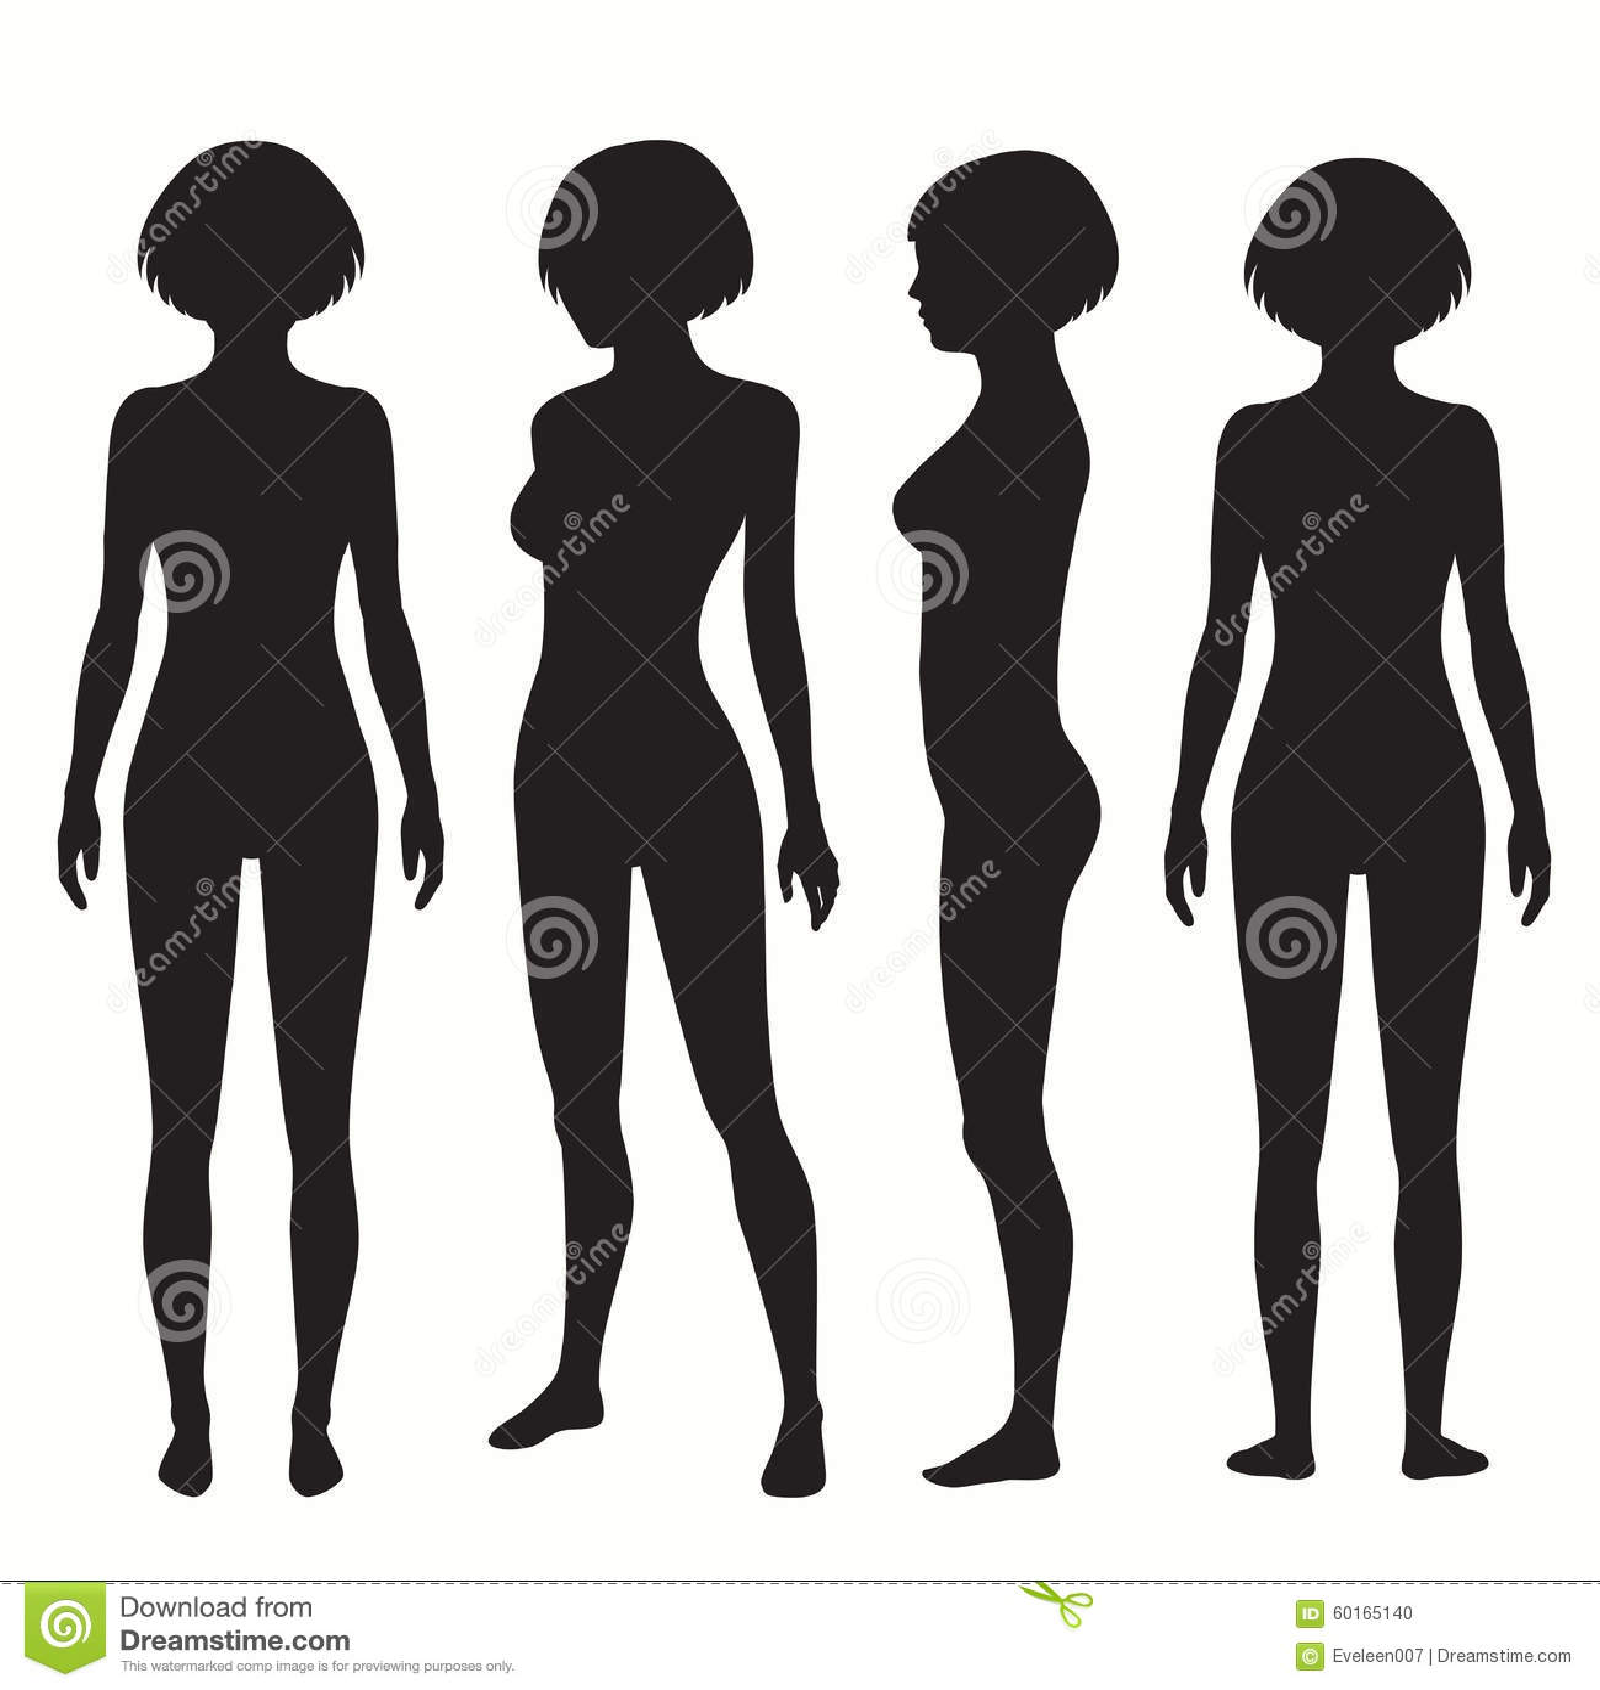 Human Body Anatomy Stock Vector - Image: 60165140